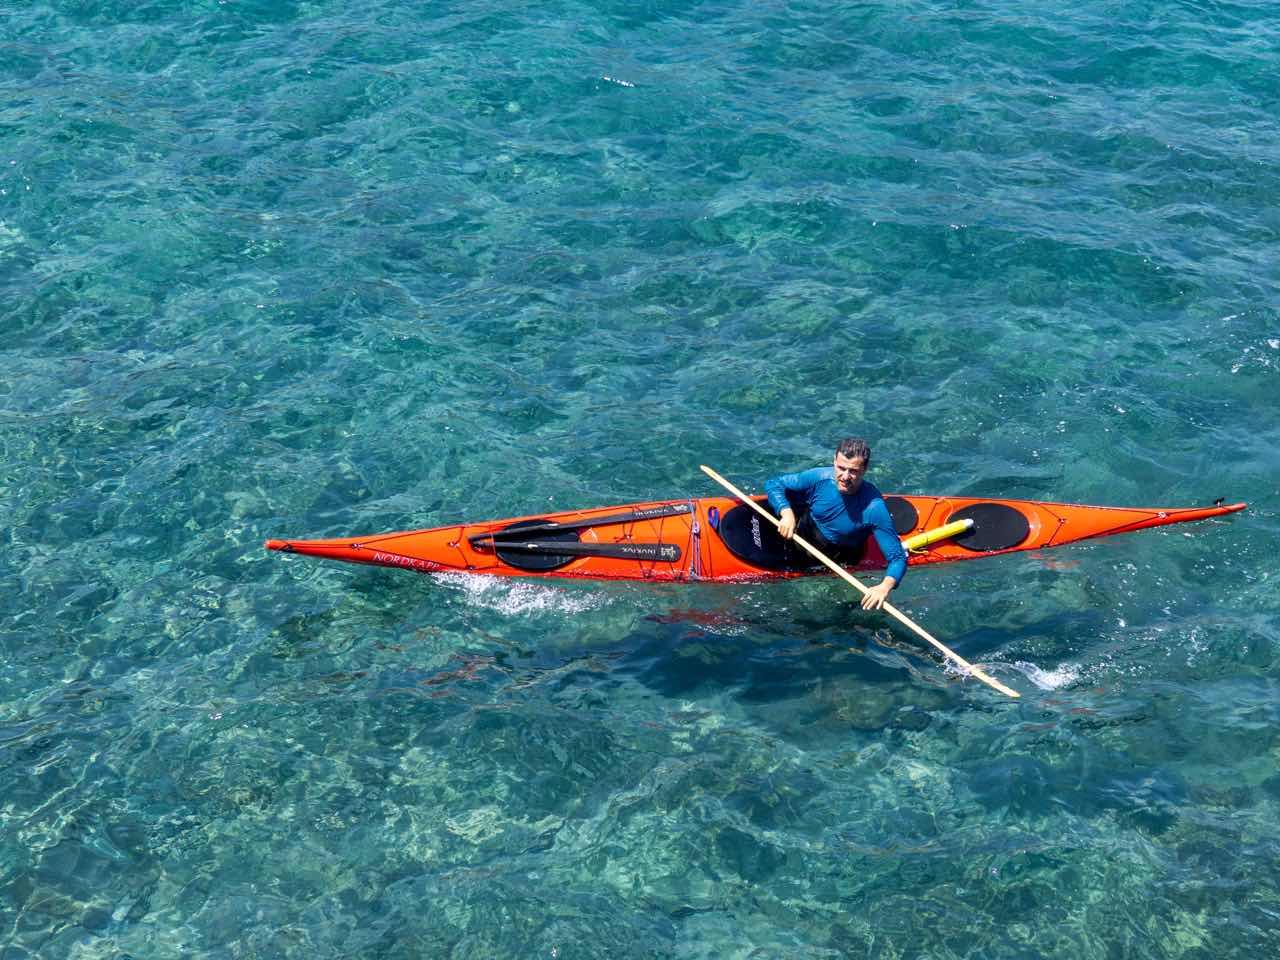 Sea Kayak Eskimo Roll Course In Crete, seakayak courses crete heraklion, sea kayak courses crete, best sea kayak company crete, best sea kayak courses crete, enjoy crete sea kayak company